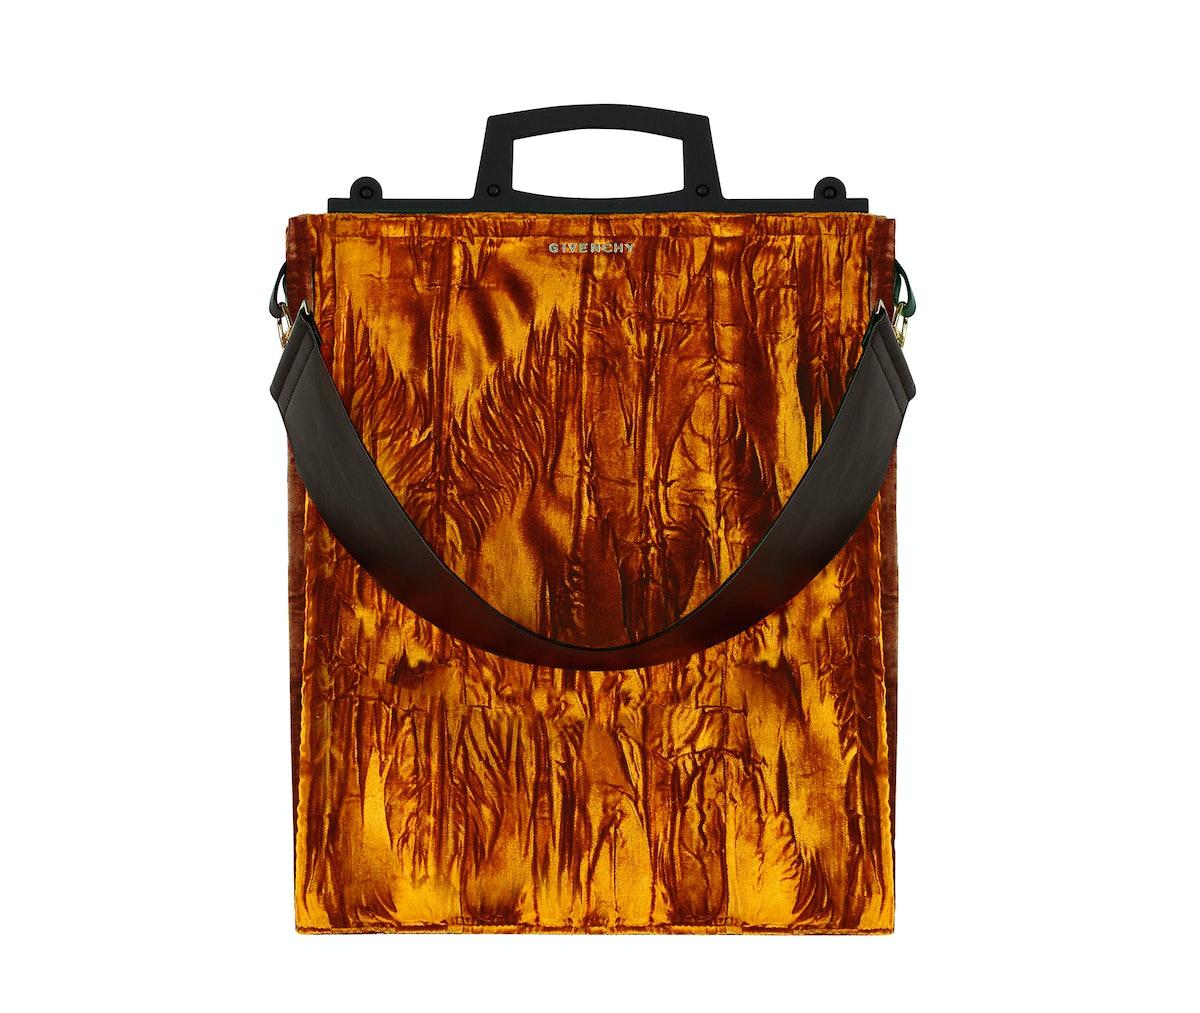 Givenchy by Riccardo Tisci bag